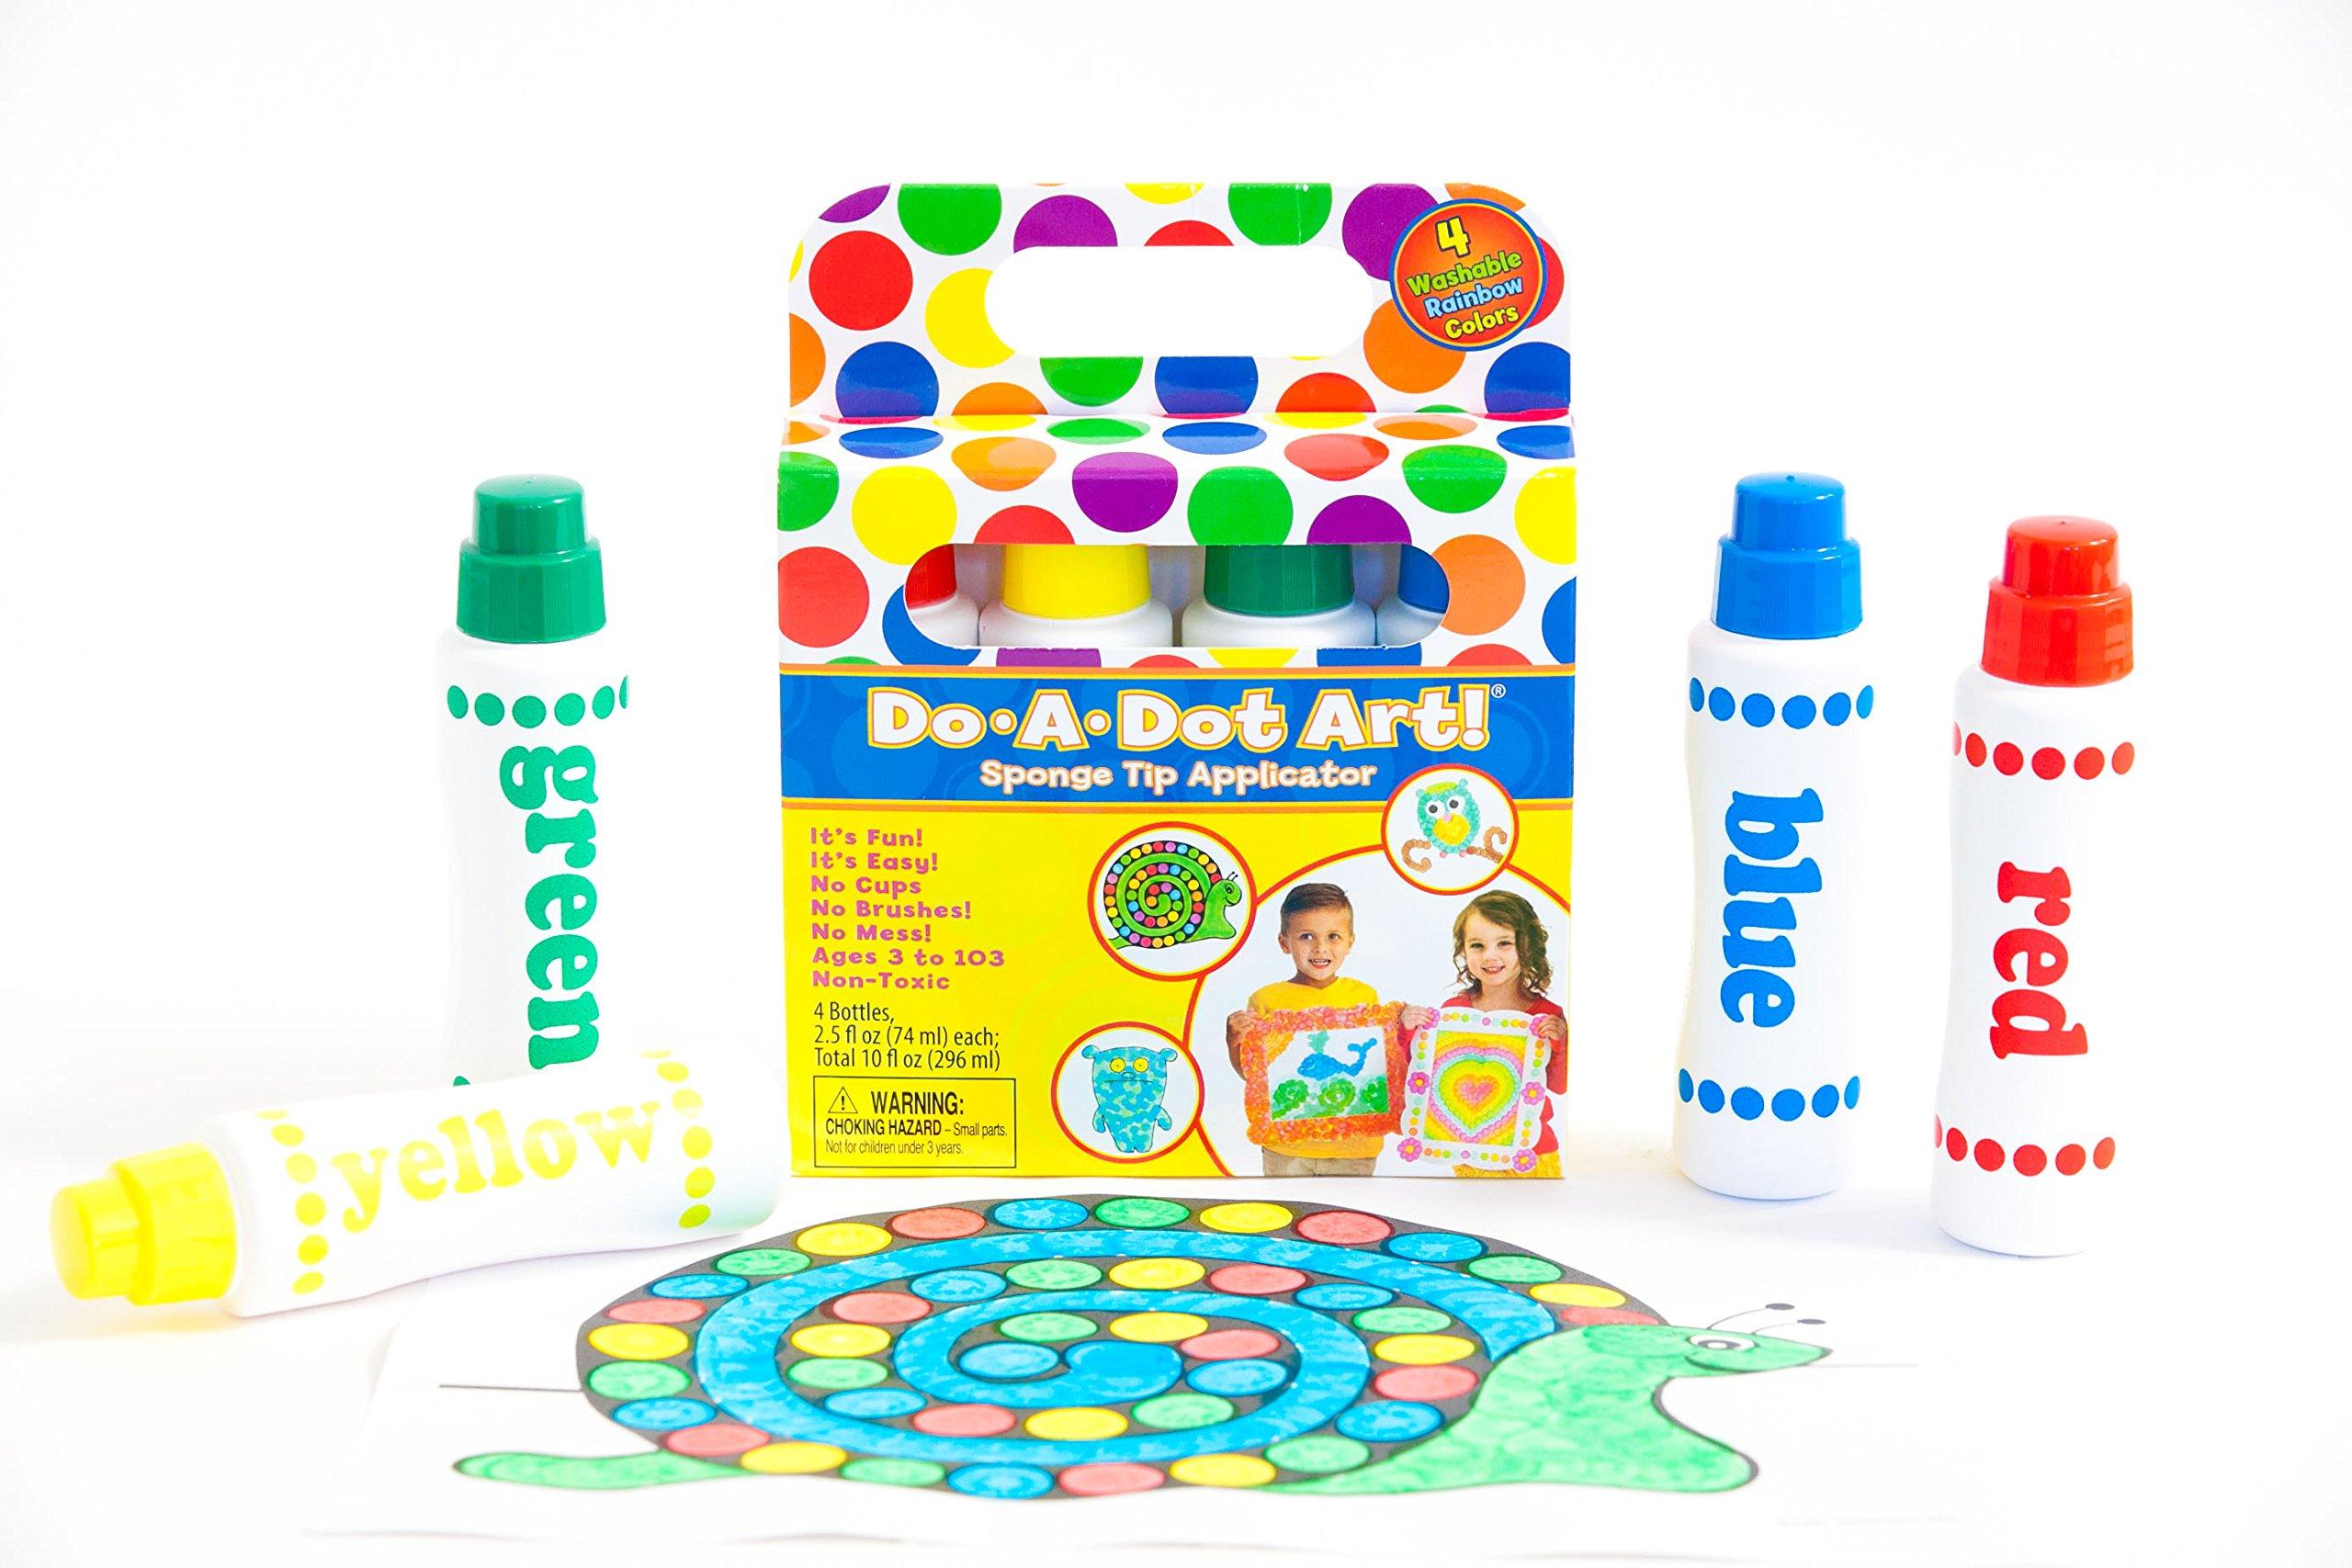 Do-A-Dot Art Rainbow 4 Pack Washable Dot Markers, The Original Dot Marker